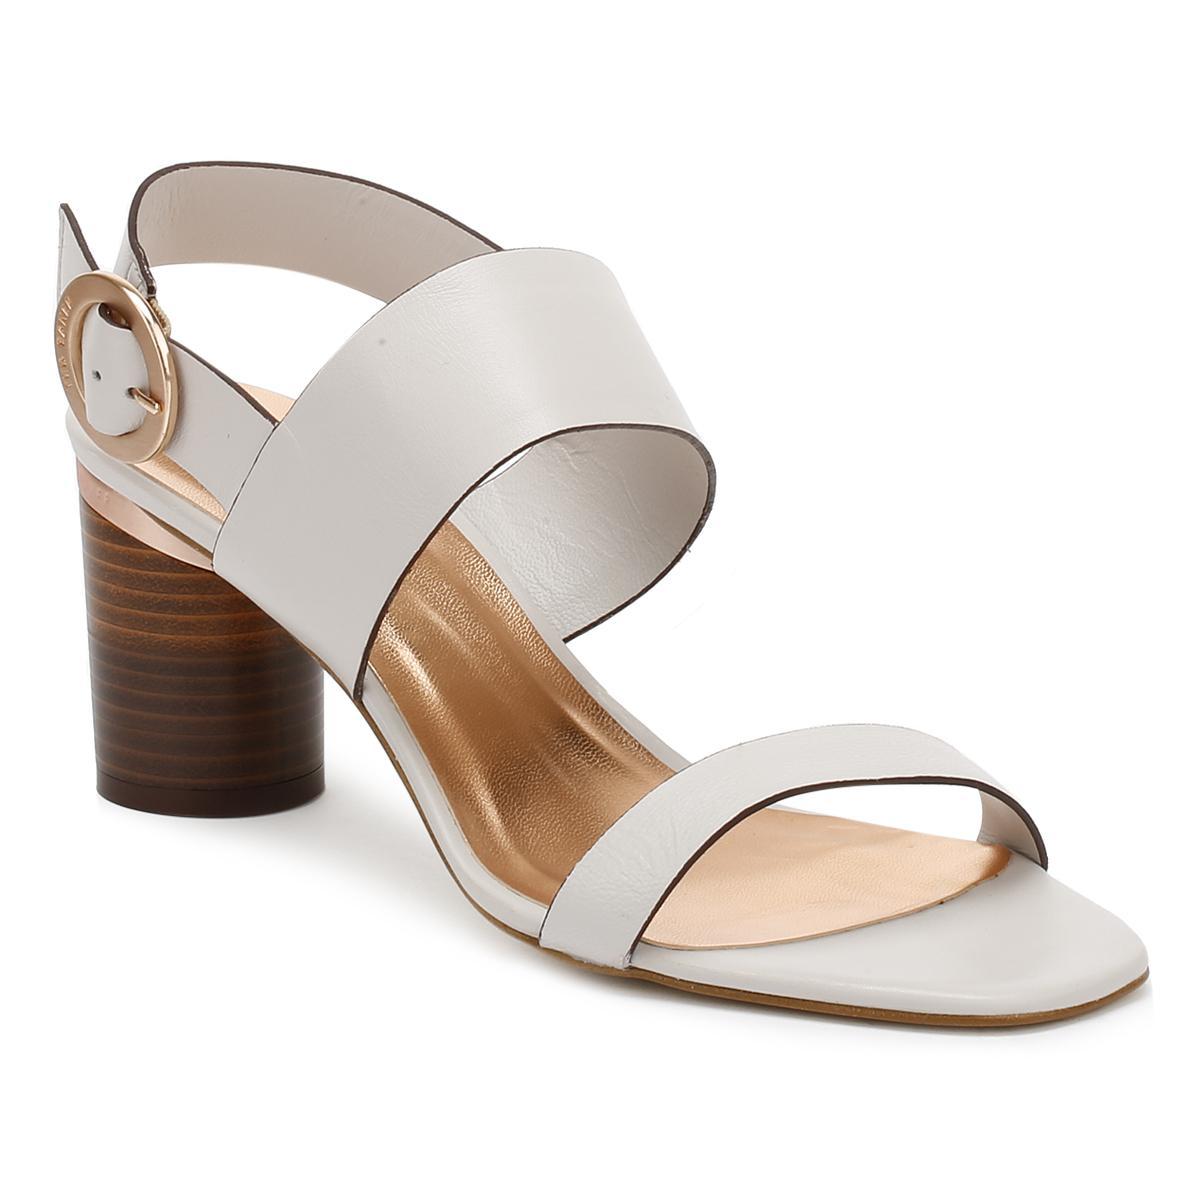 c68b39ad09ac1 Lyst - Ted Baker Womens Light Grey Azmara Heel Sandals in Gray